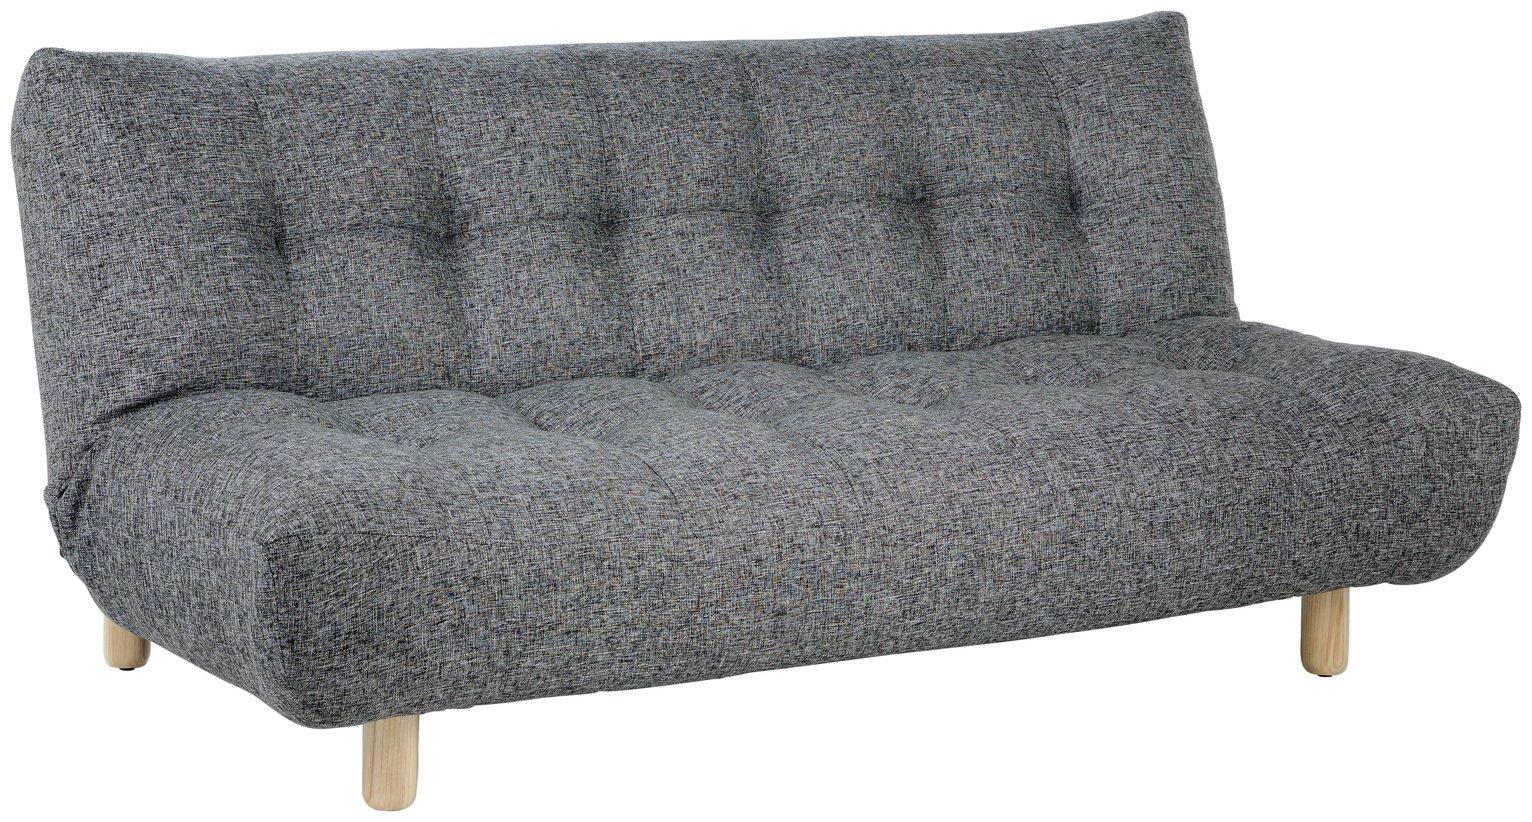 Buy Habitat Kota 2 Seater Fabric Sofa Bed Black and White Sofa